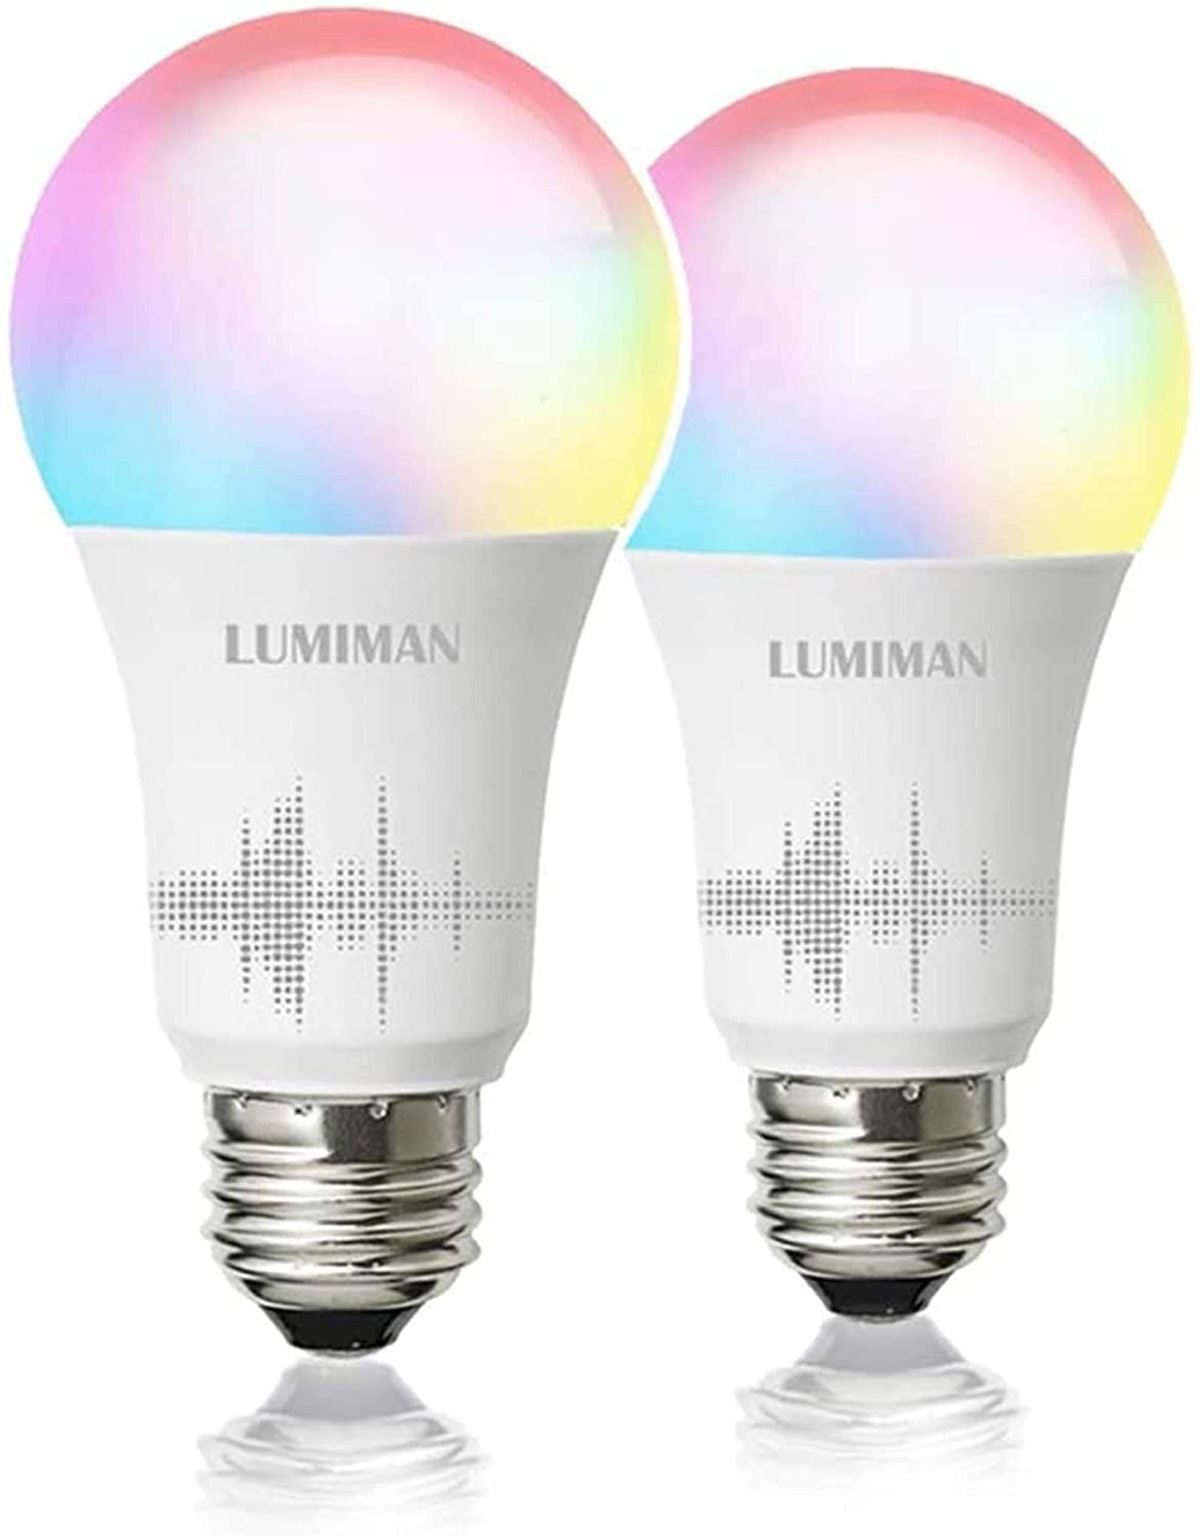 LUMMAN Color-Changing Smart Light Bulbs